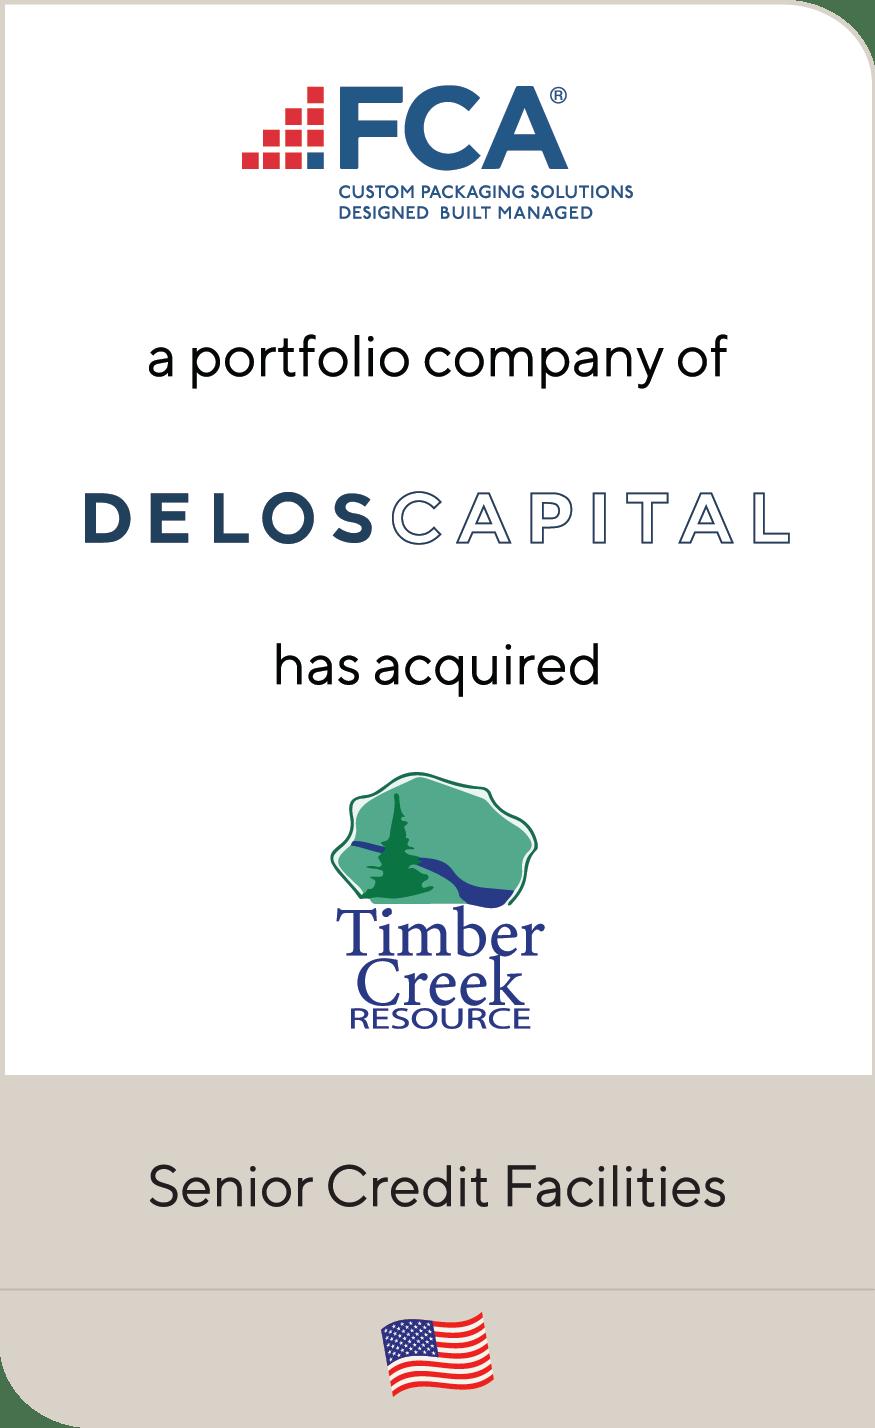 FCA Packaging Delos Capital Timber Creek 2021